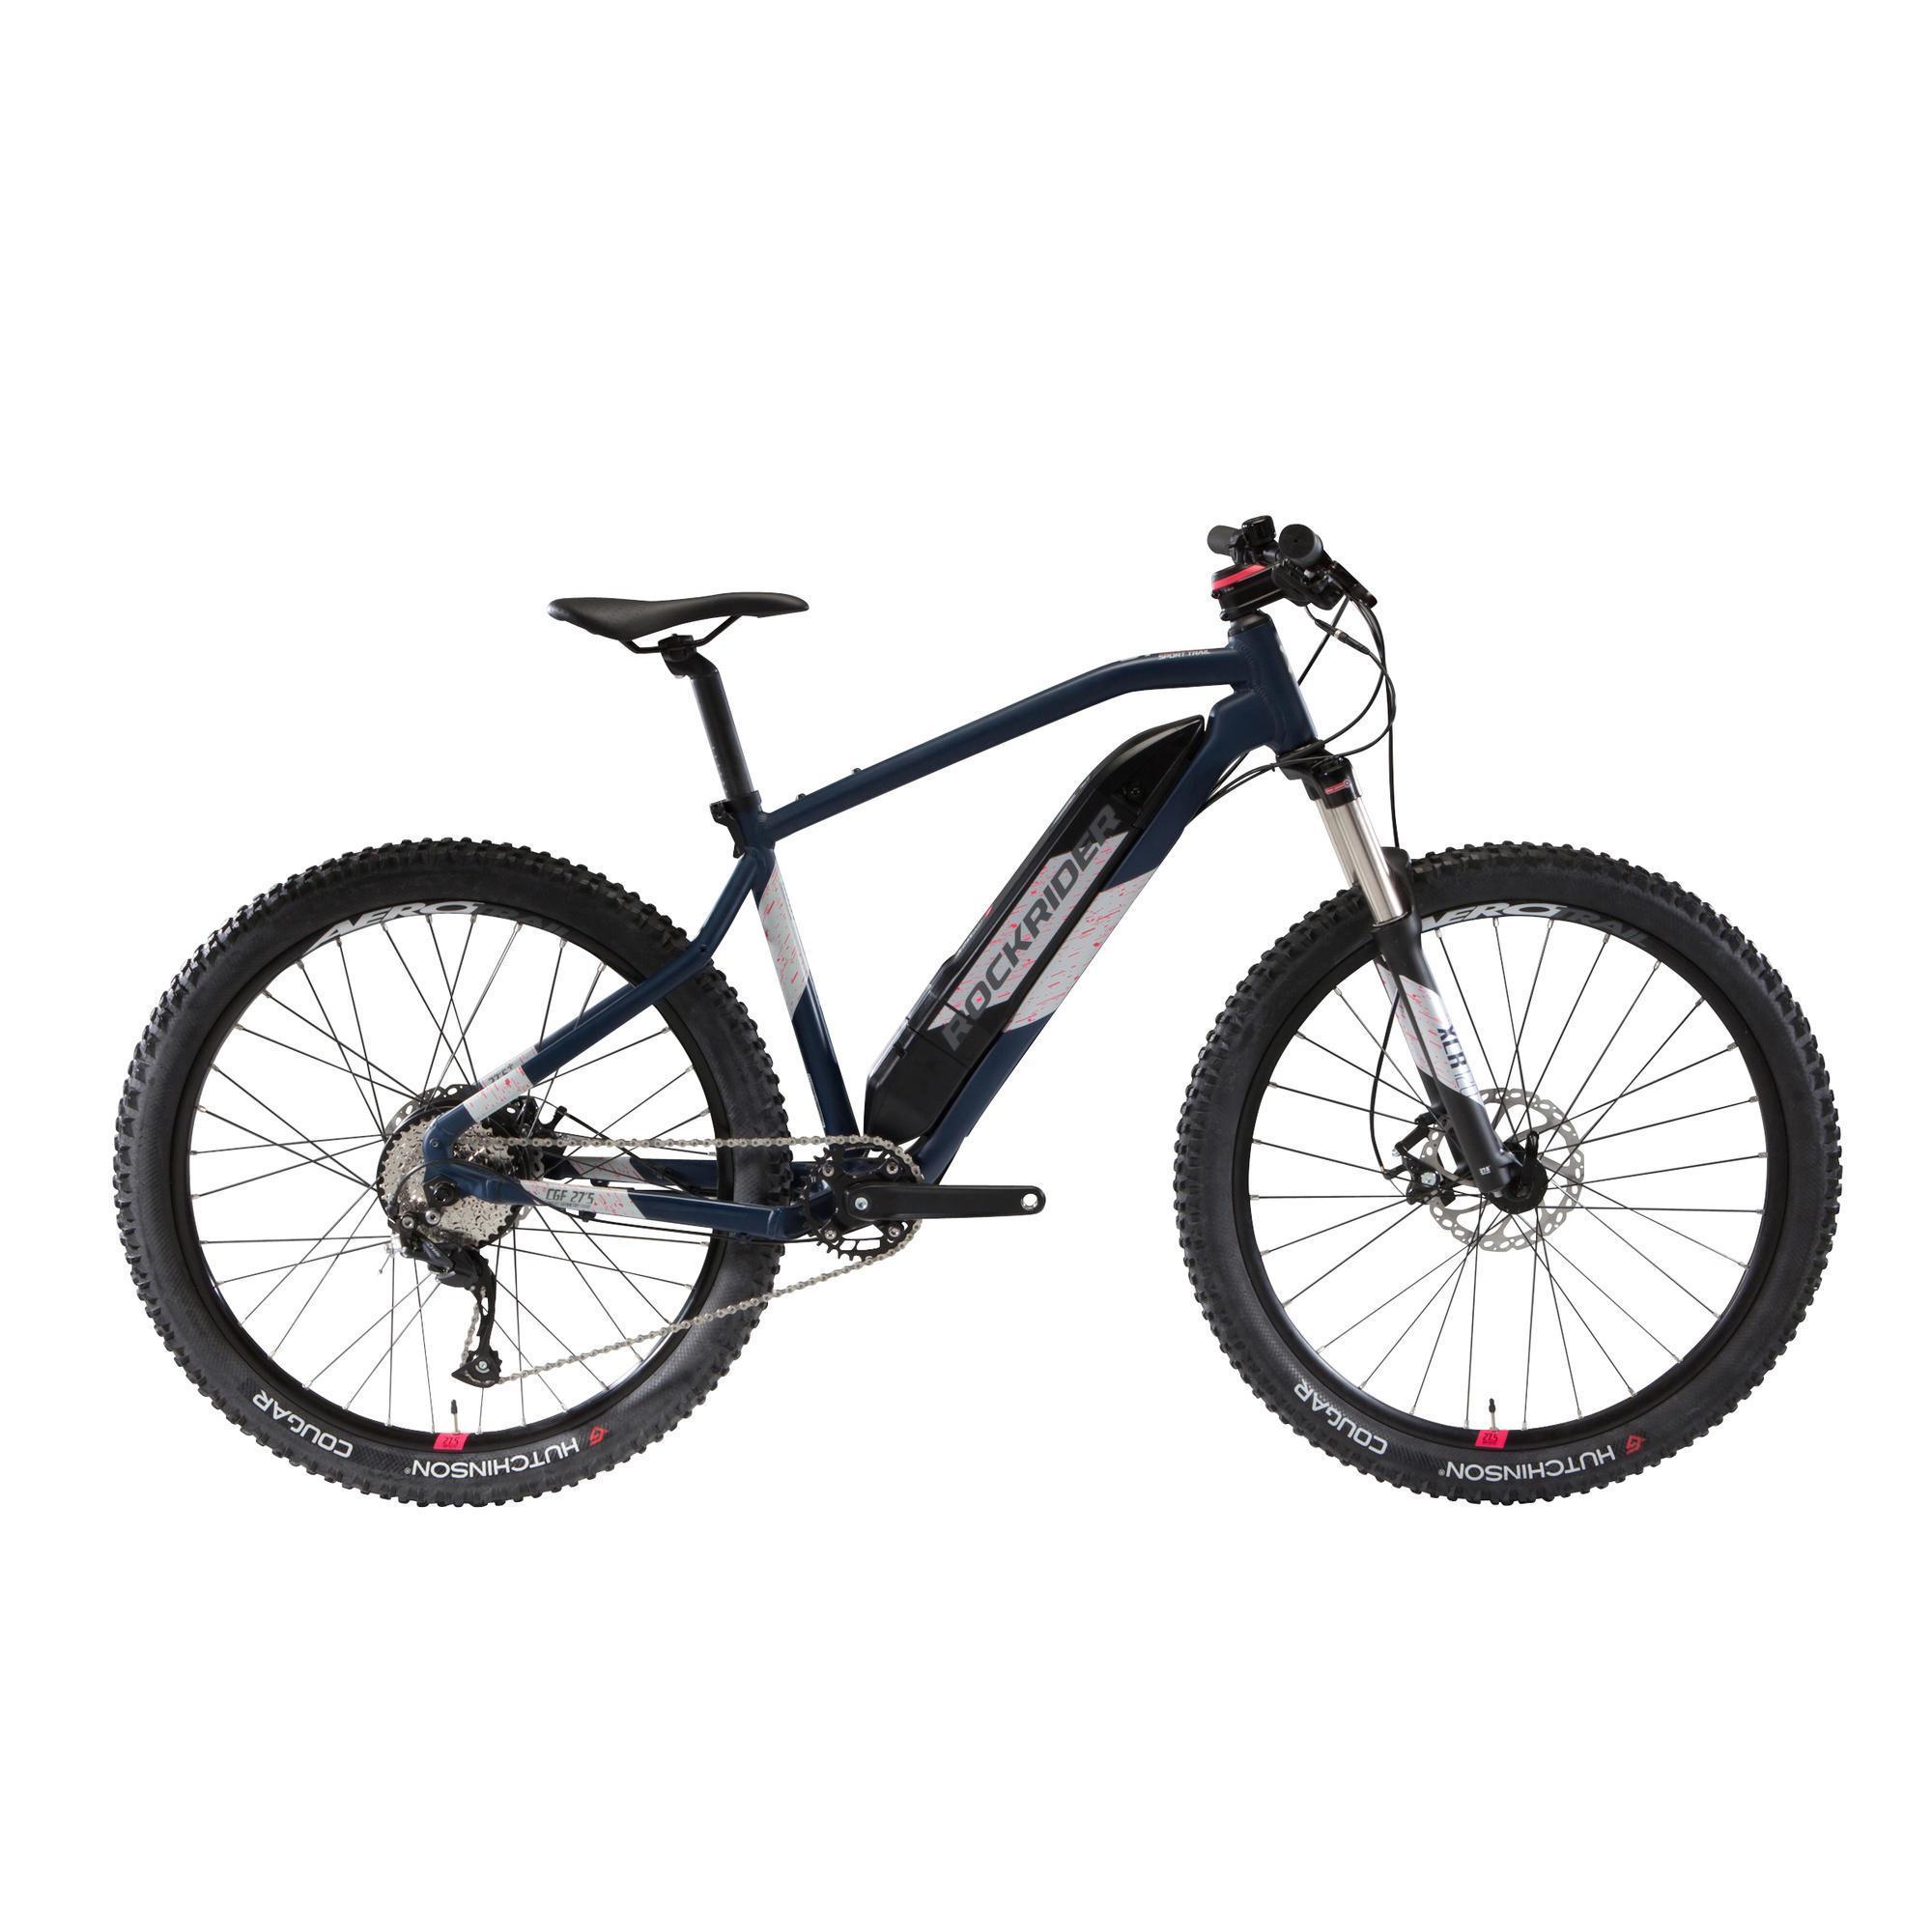 E Bike Günsitge E Bikes Ausgezeichnete Technik Btwin Decathlon